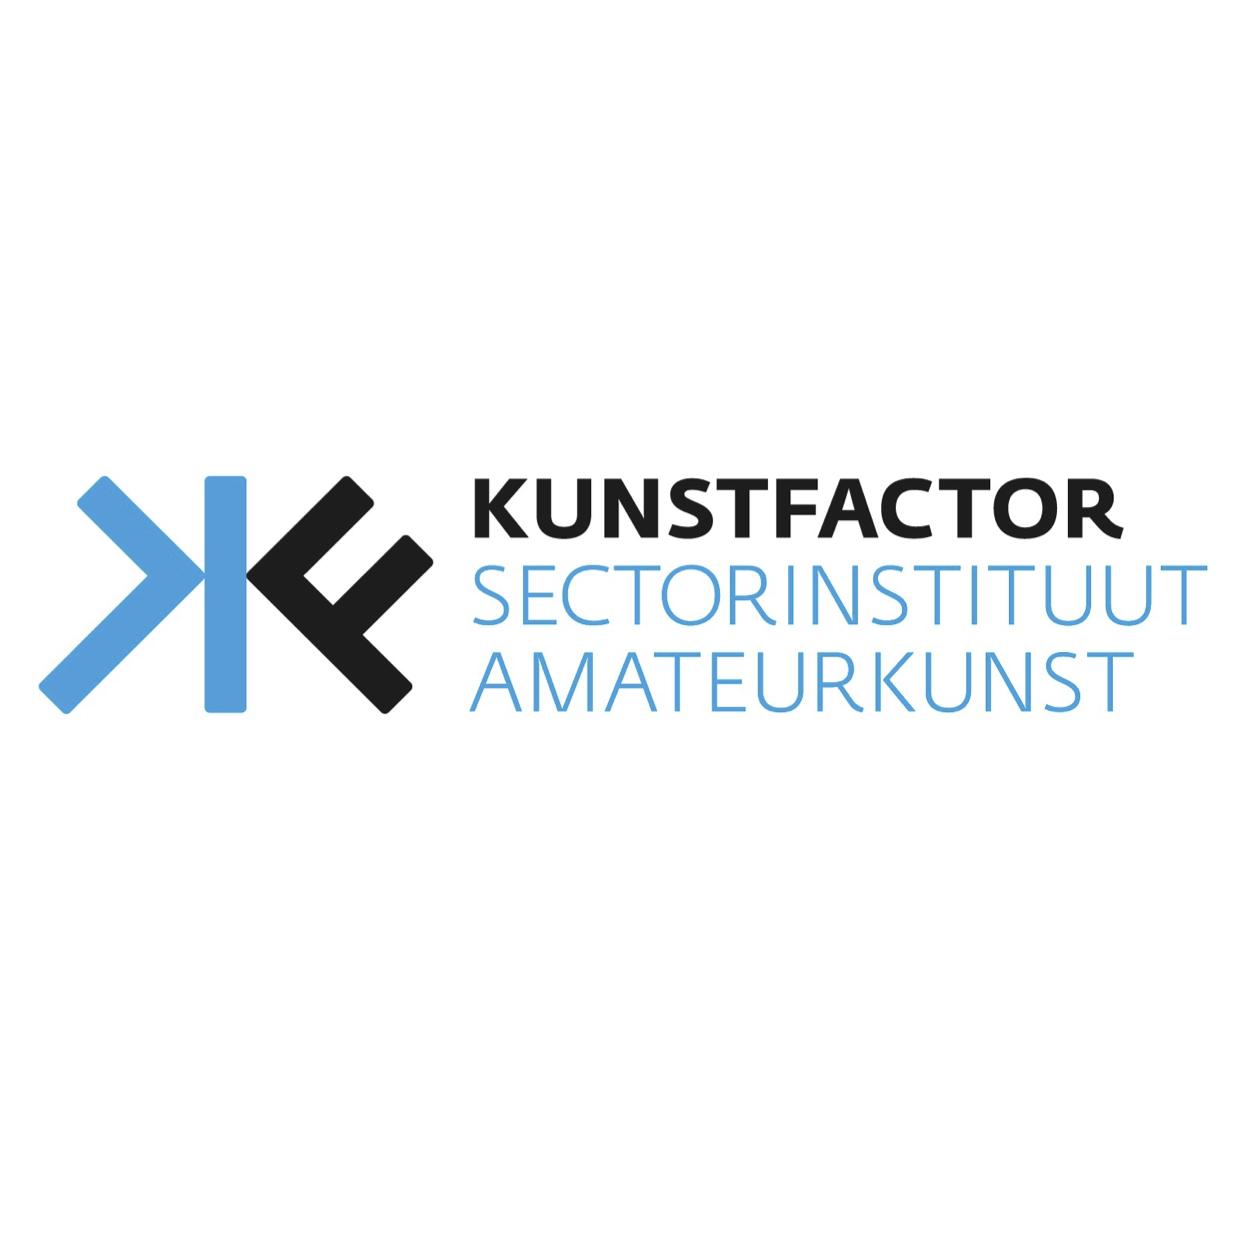 Mindnote client Kunstfactor